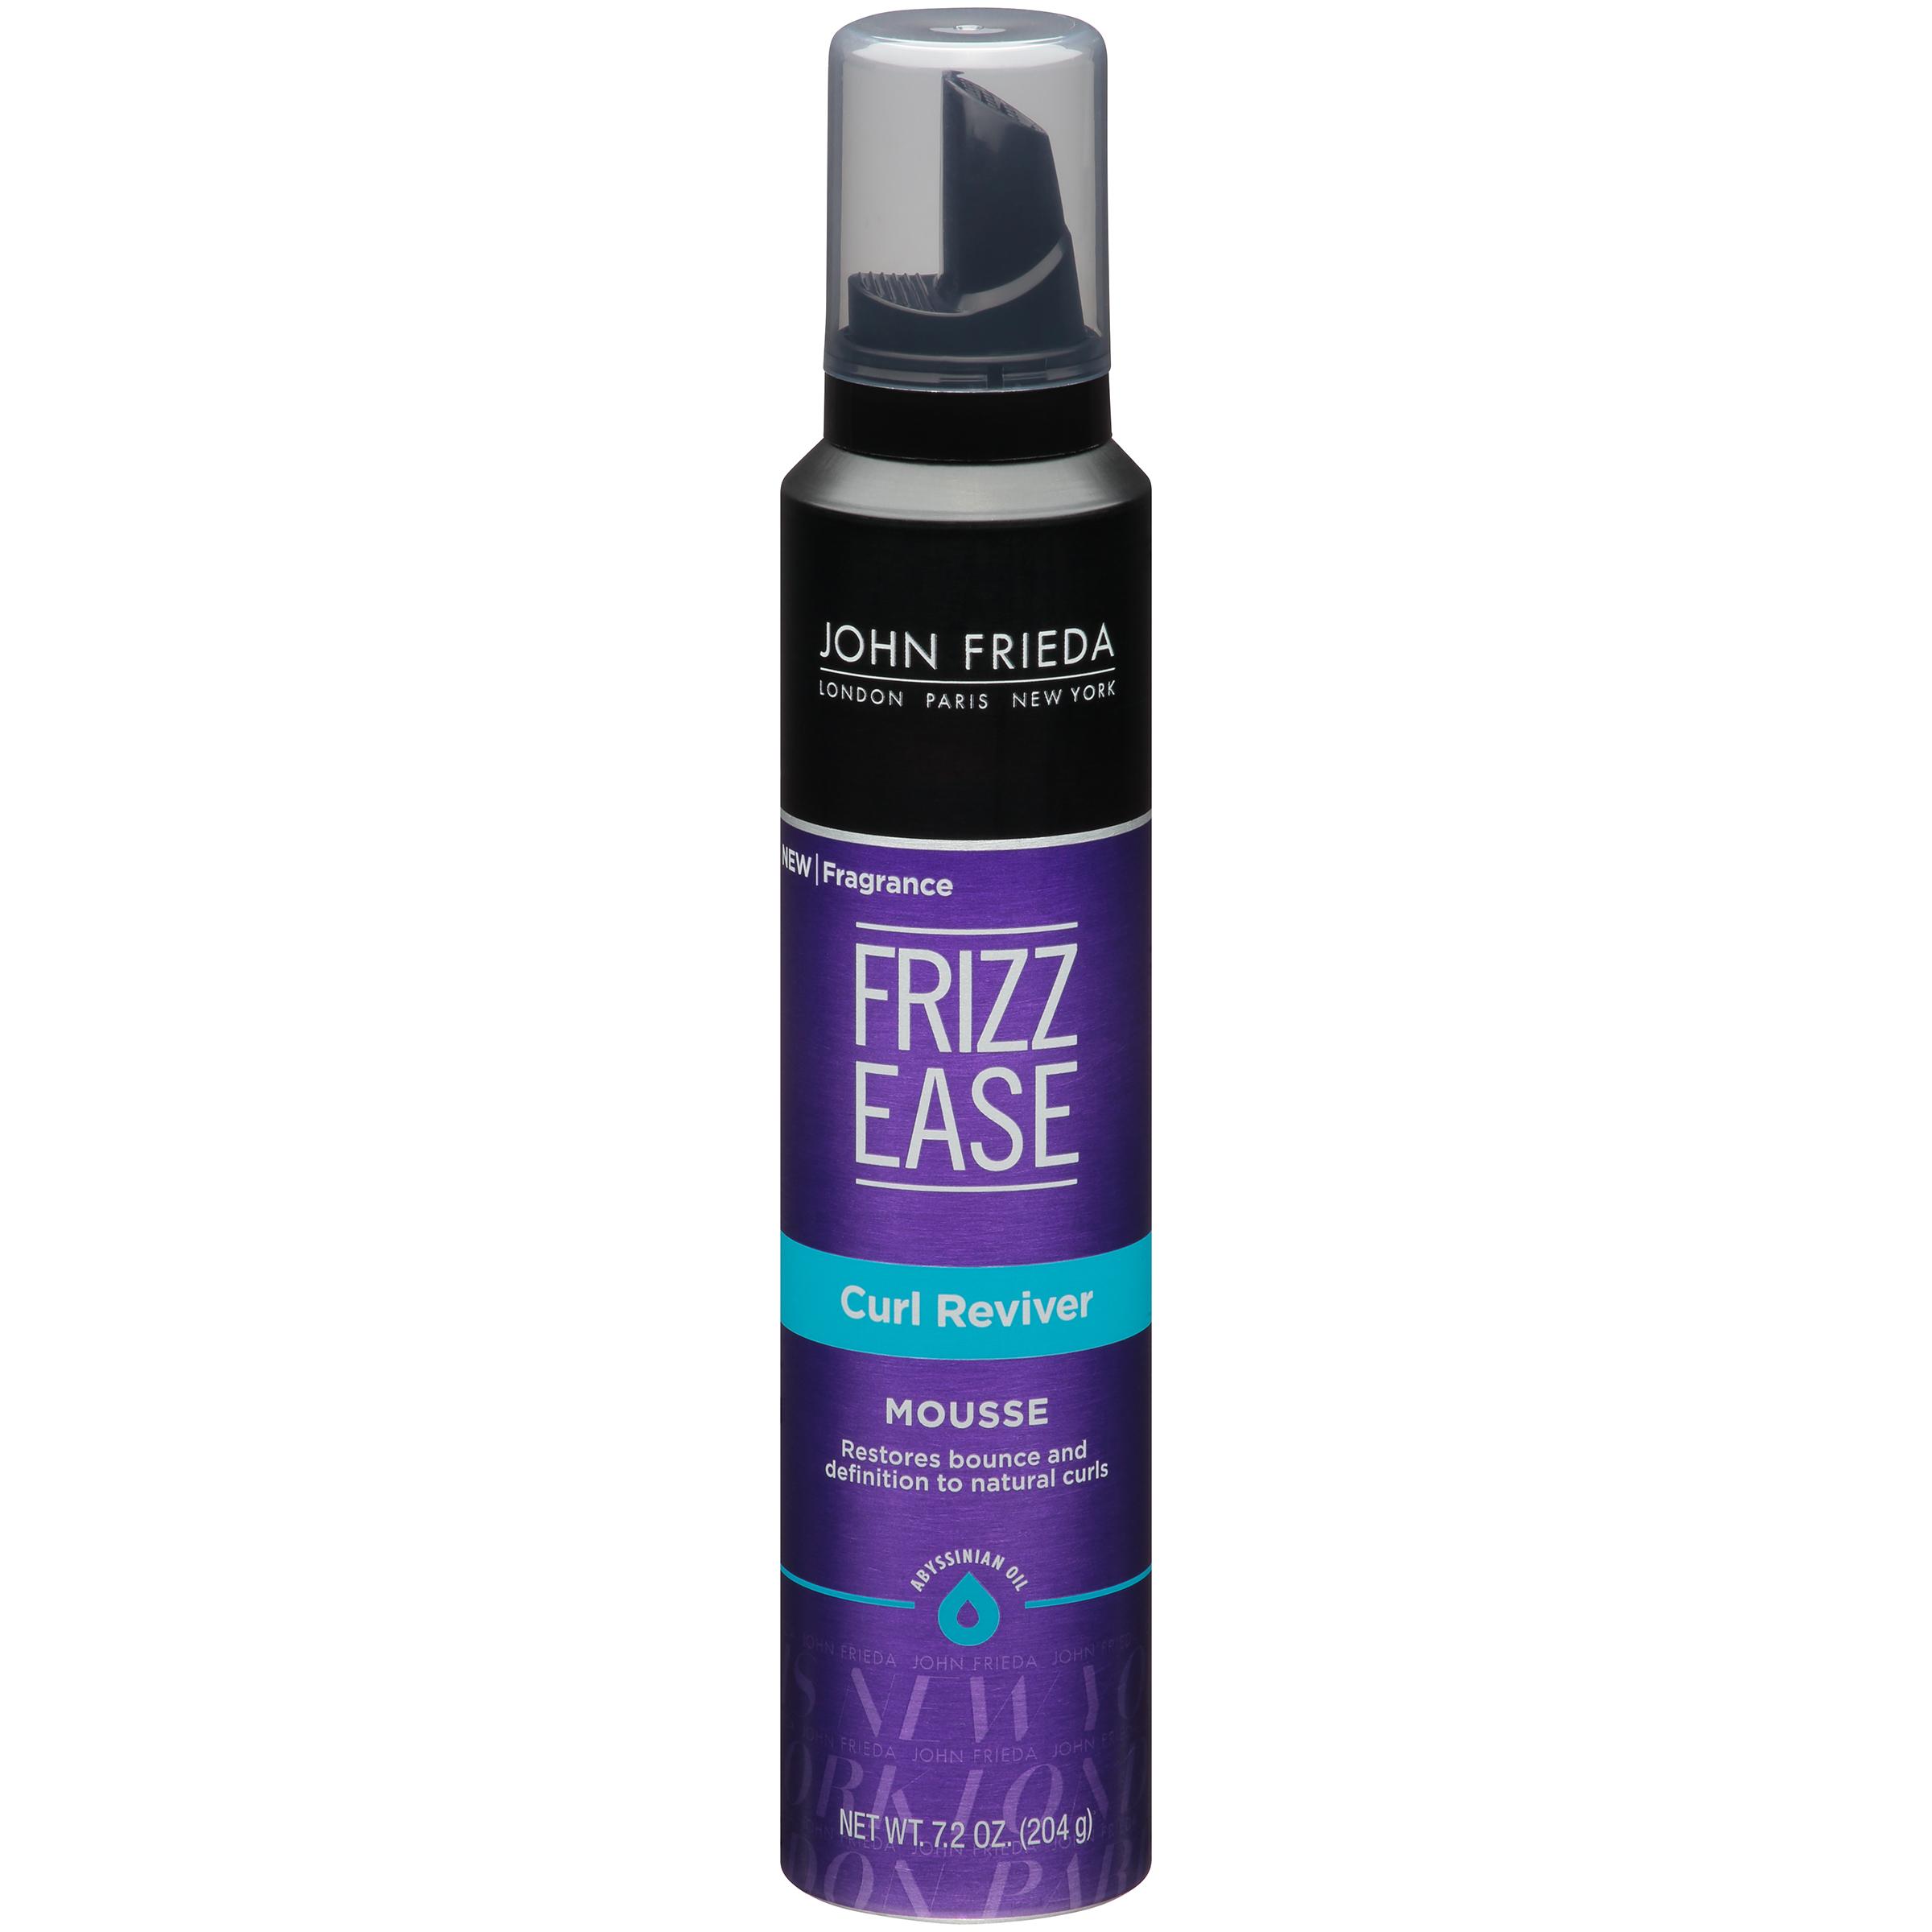 John Frieda Take Charge Curl-Boosting Mousse 7.2 oz (204 g)